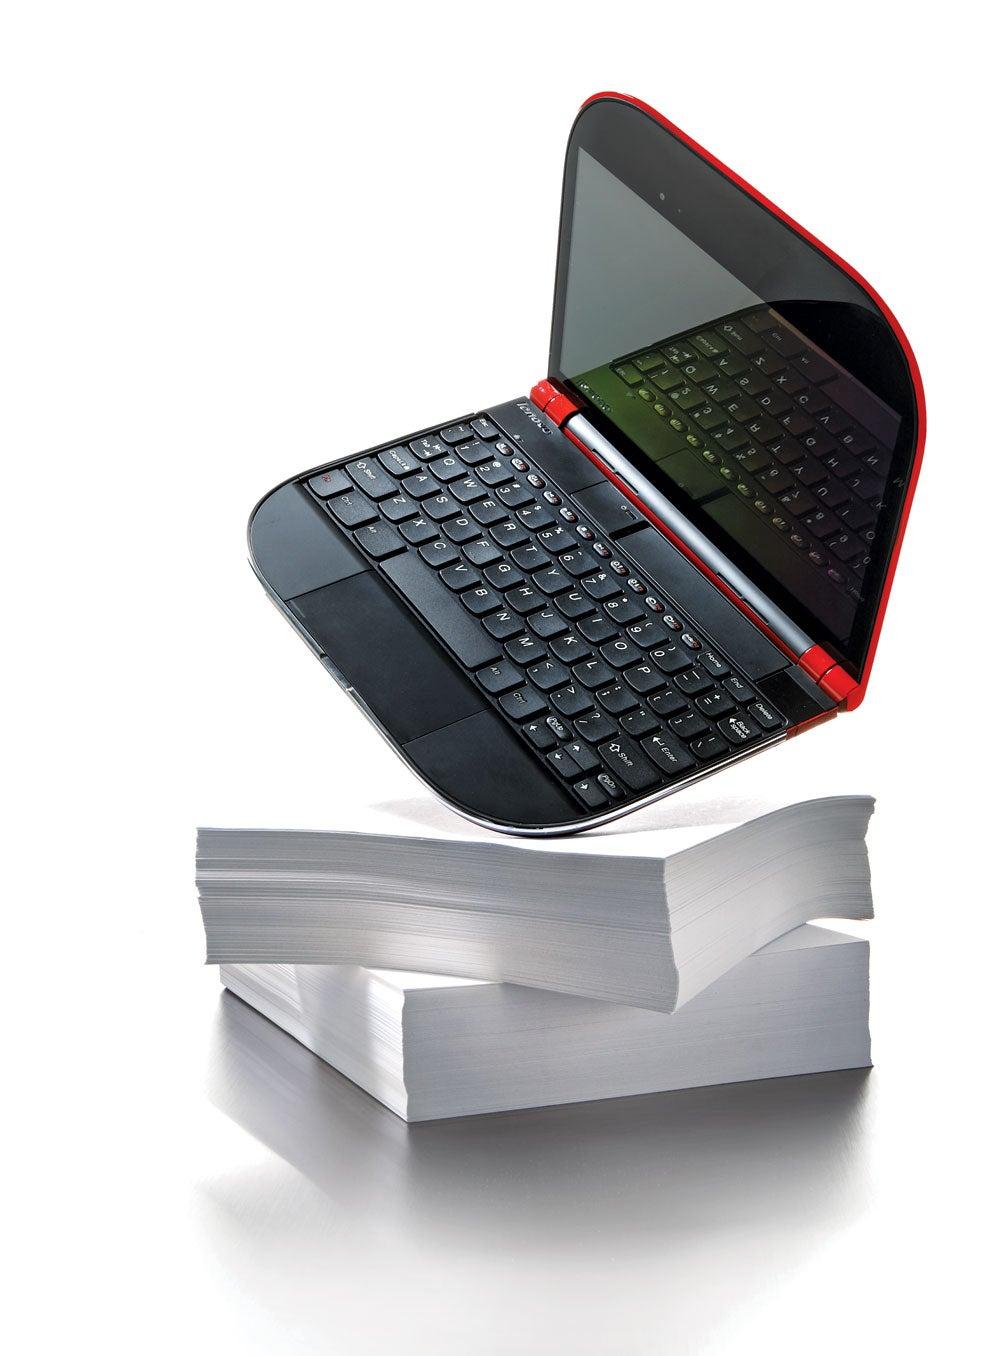 Lenovo Skylight Laptop Is a Phone At Heart